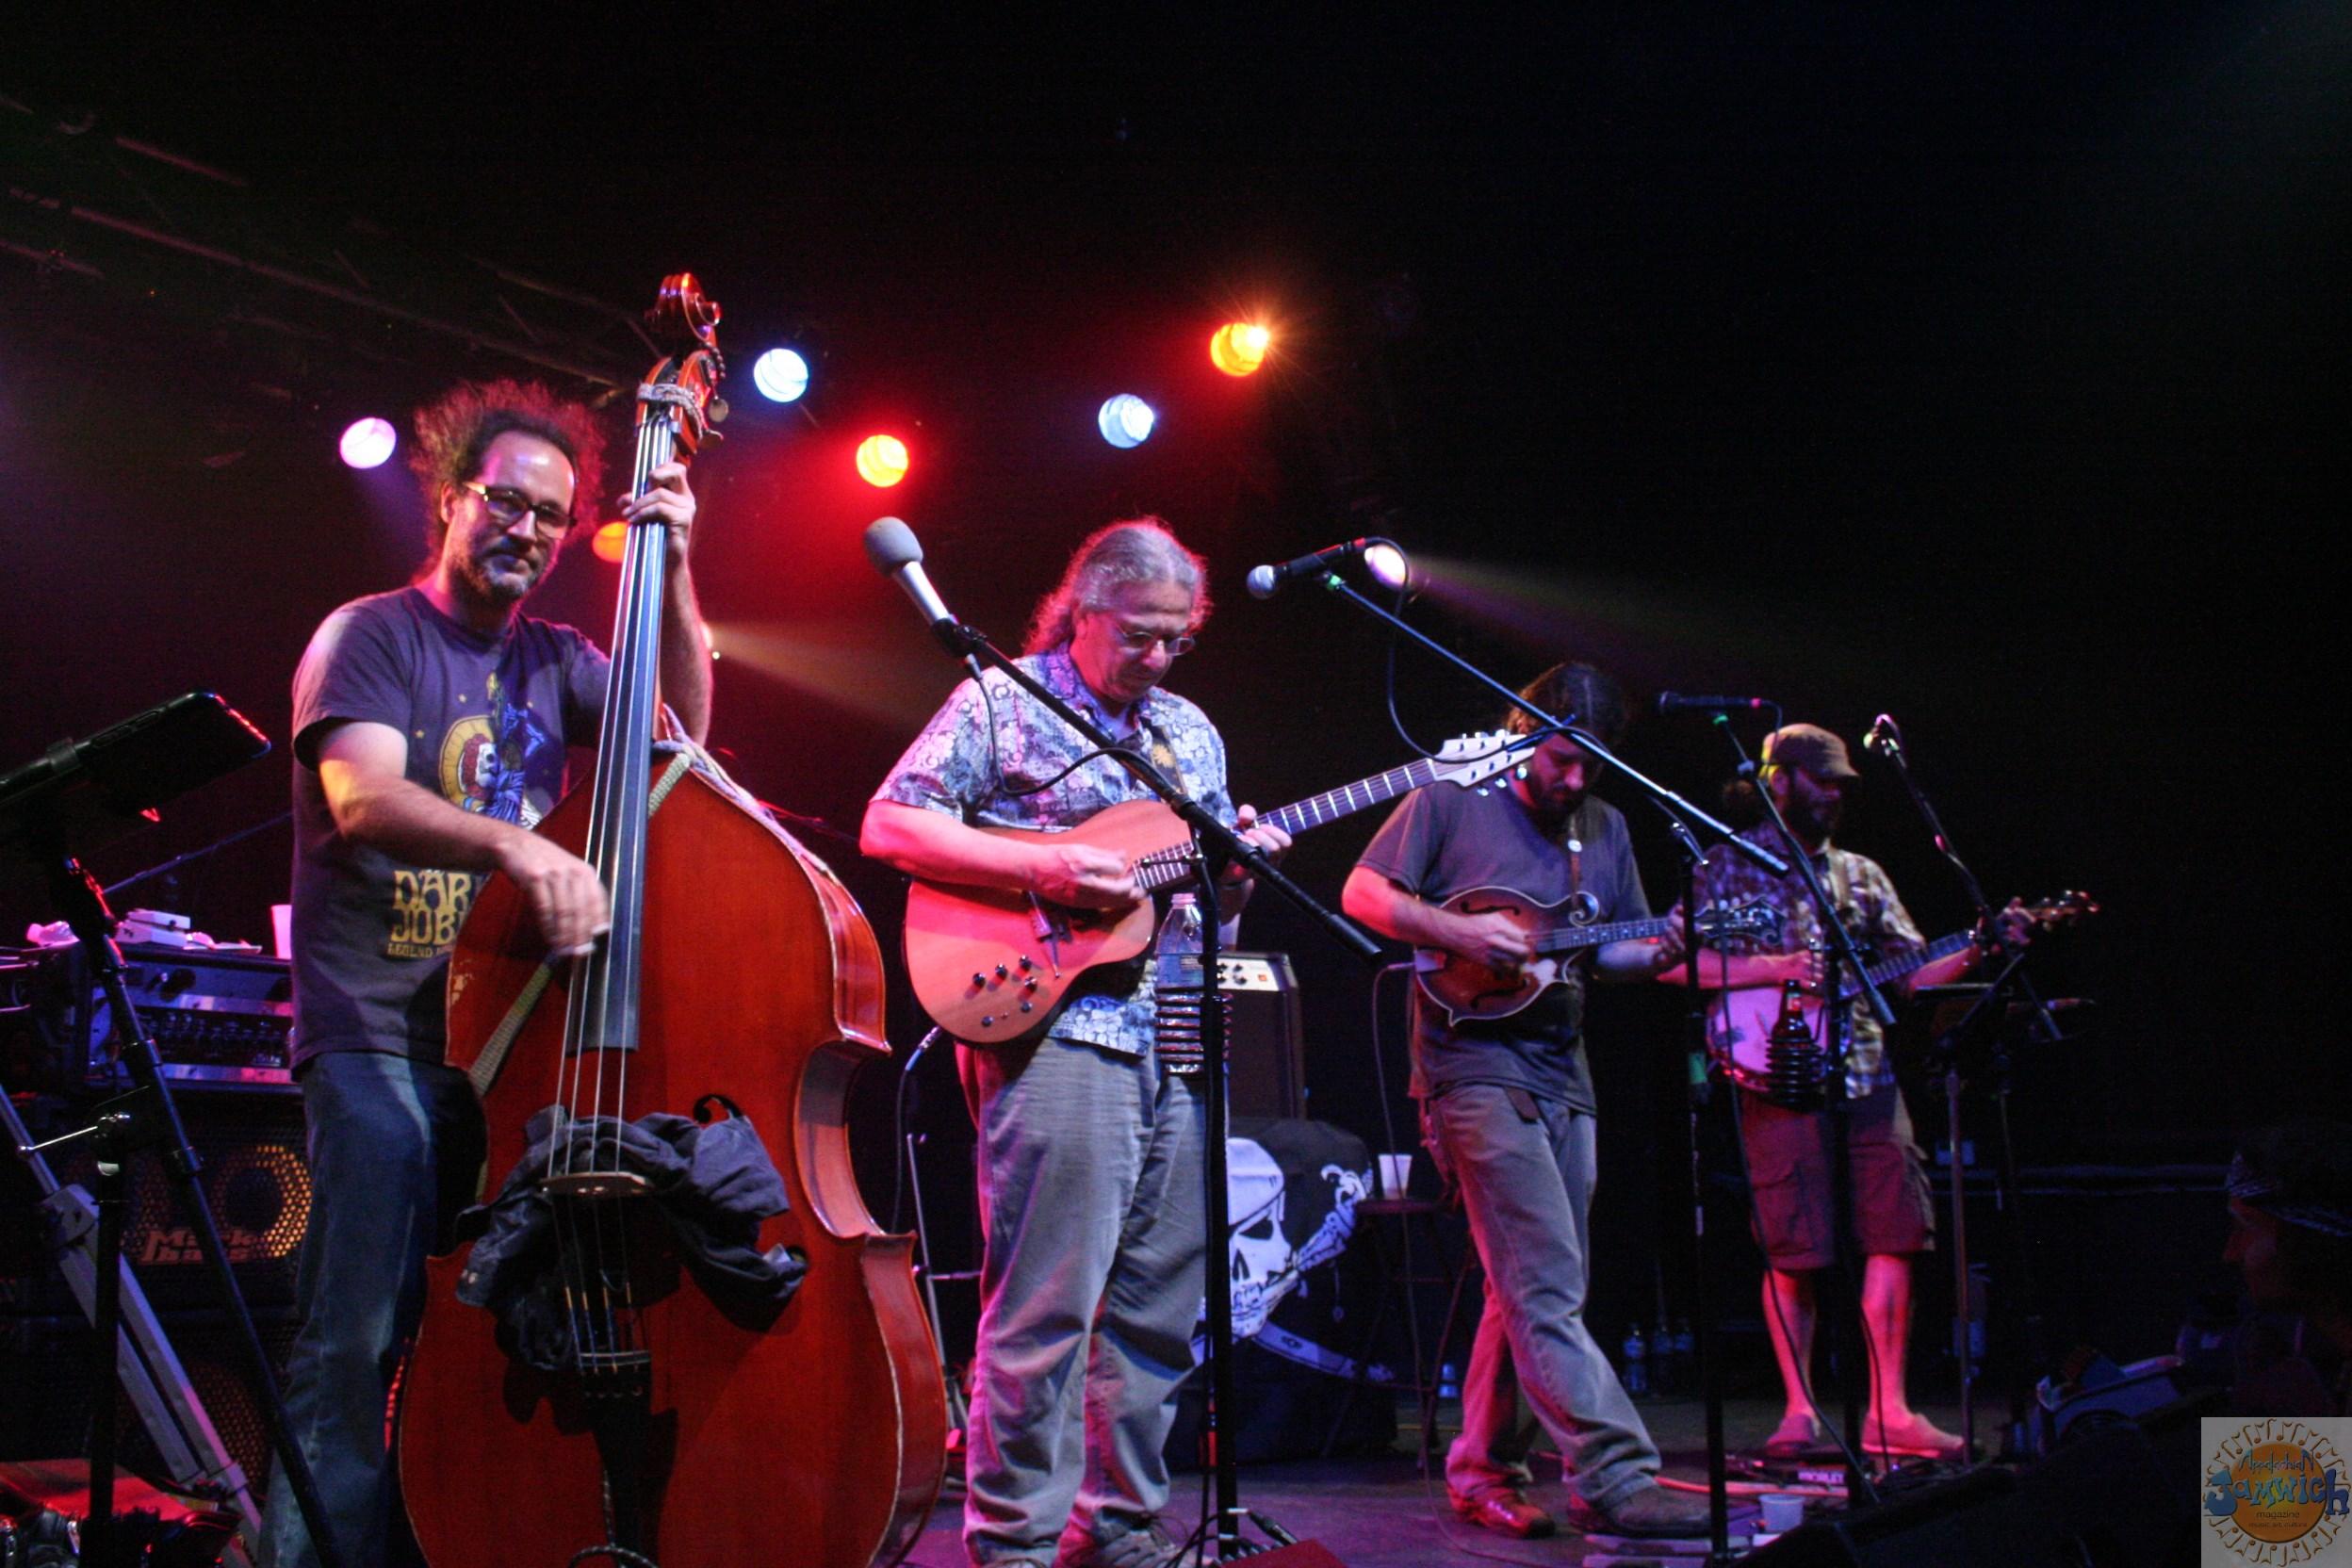 Rumpke Mountain Boys, Floodwood and David Gans – Pittsburgh, PA – 9/11/13